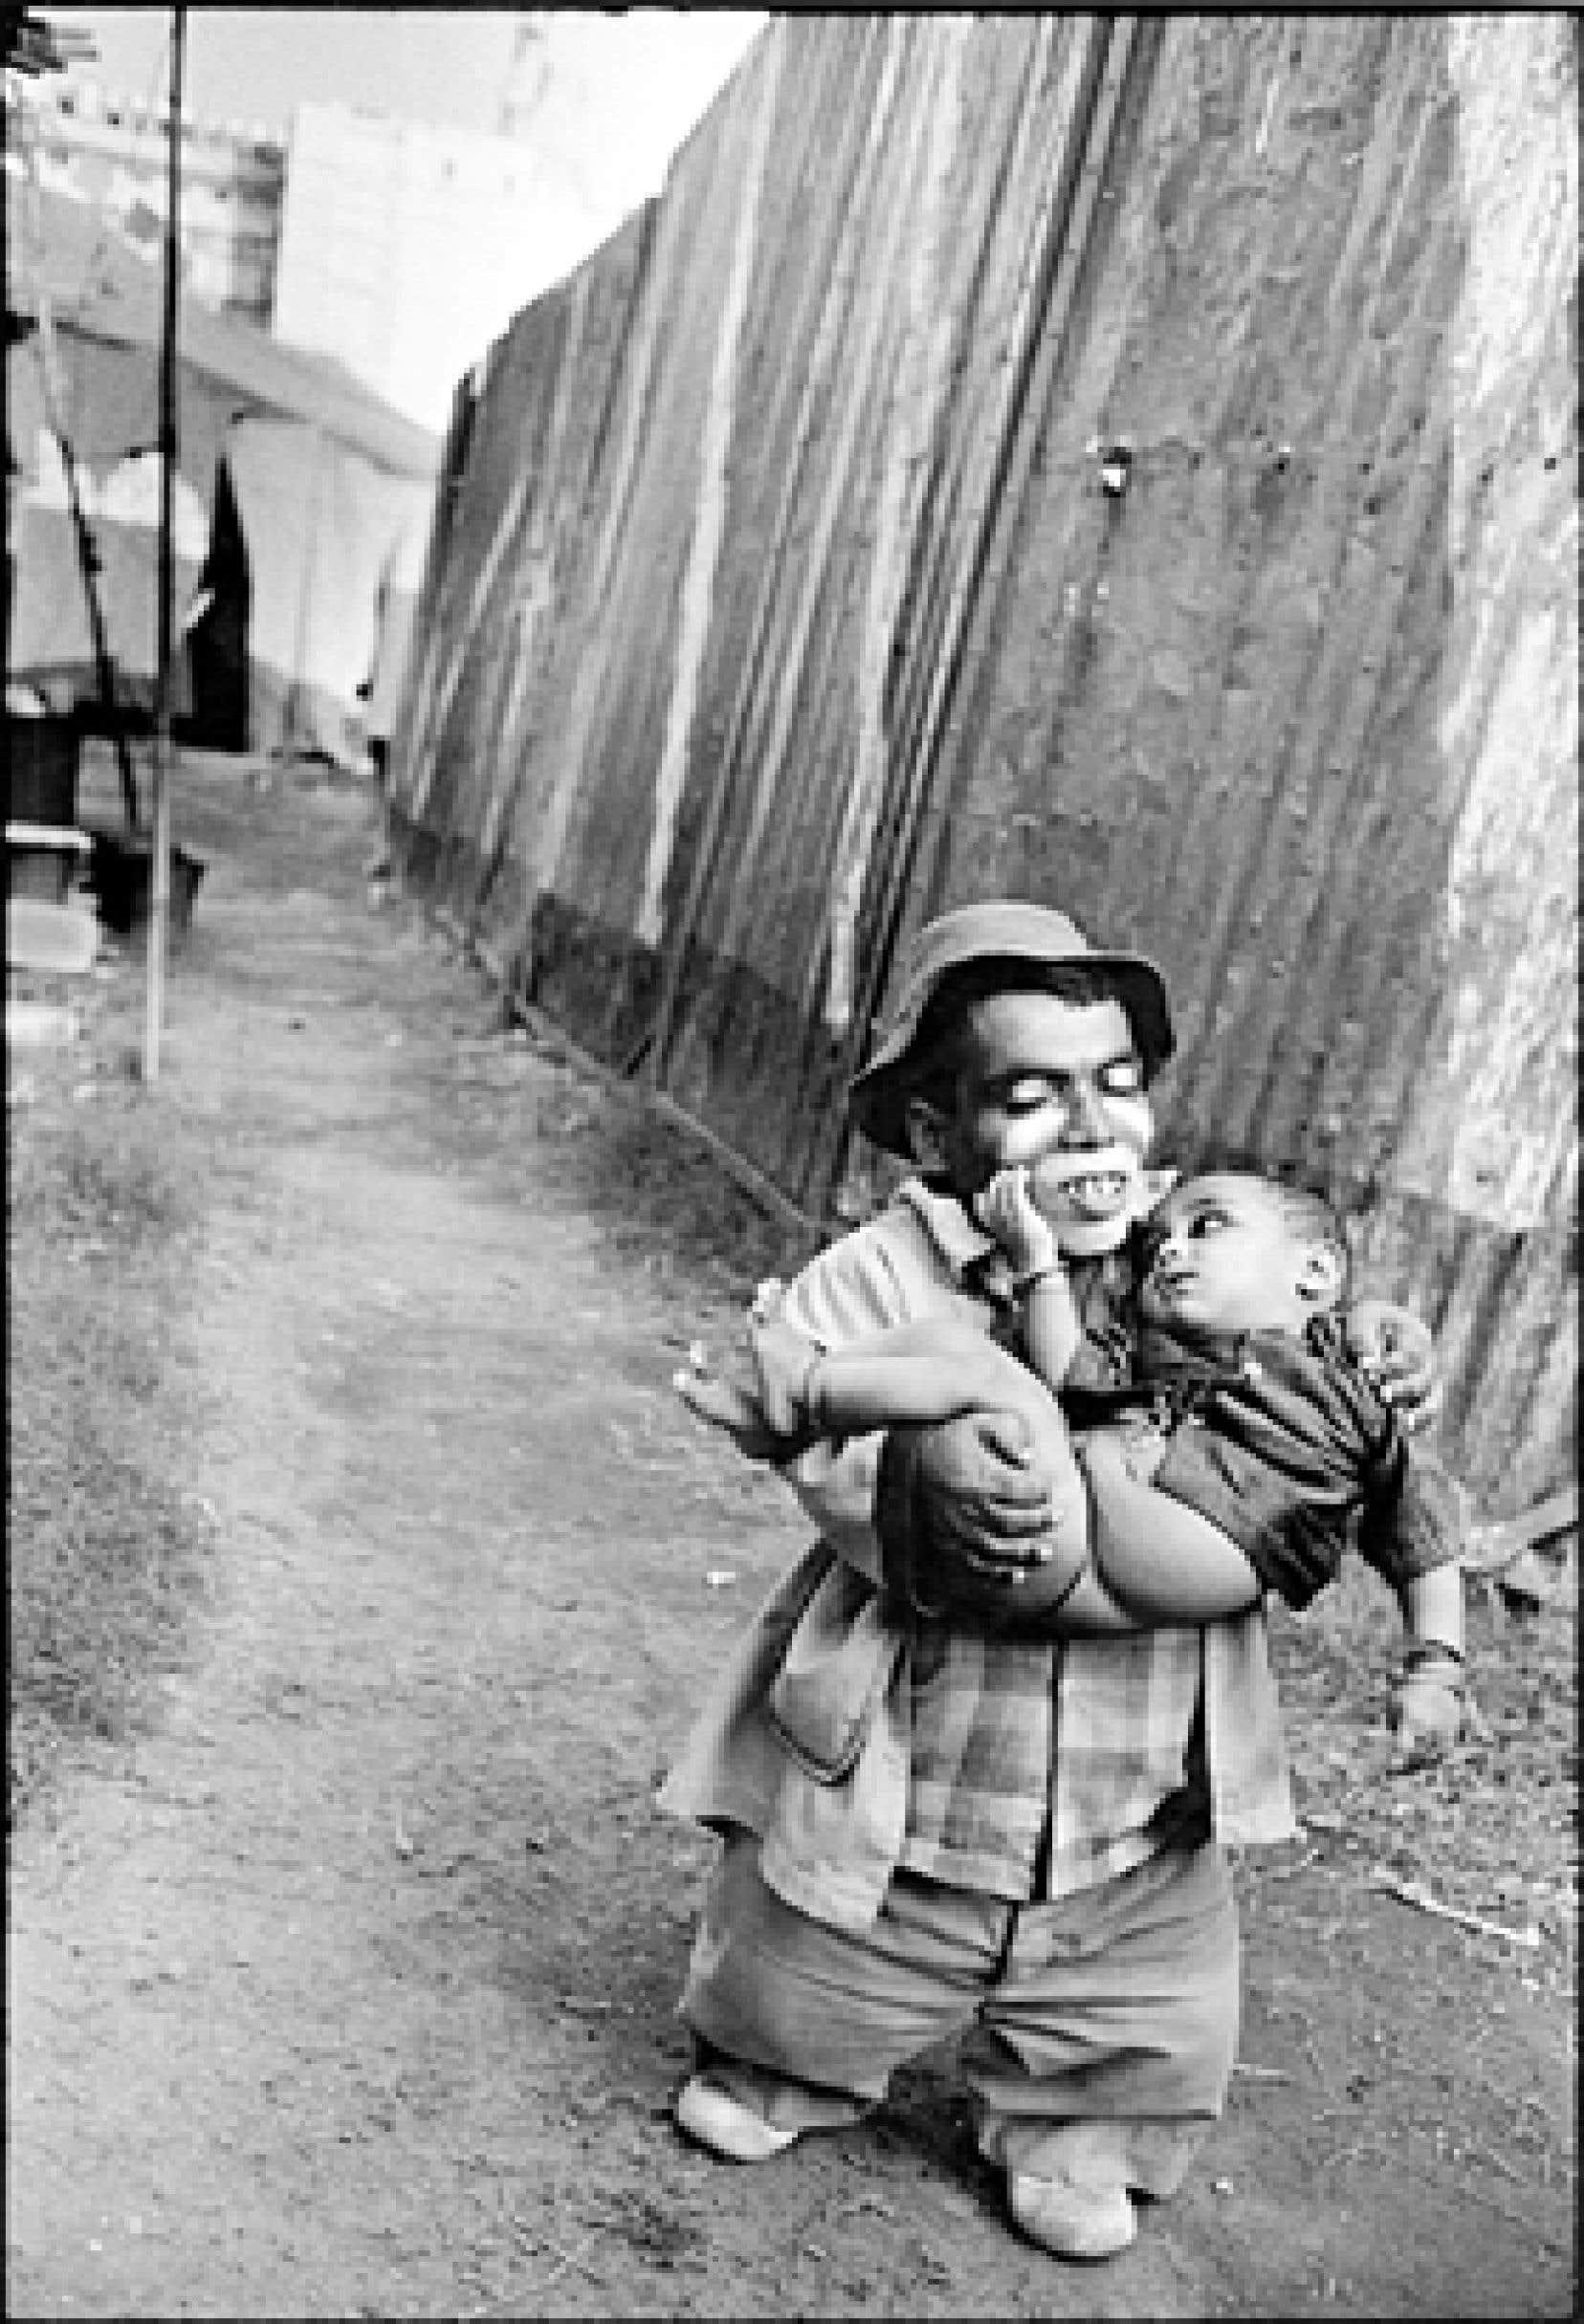 Usman portant son fils, Jumbo Circus, Bombay, 1992, photo de Mary Ellen Mark